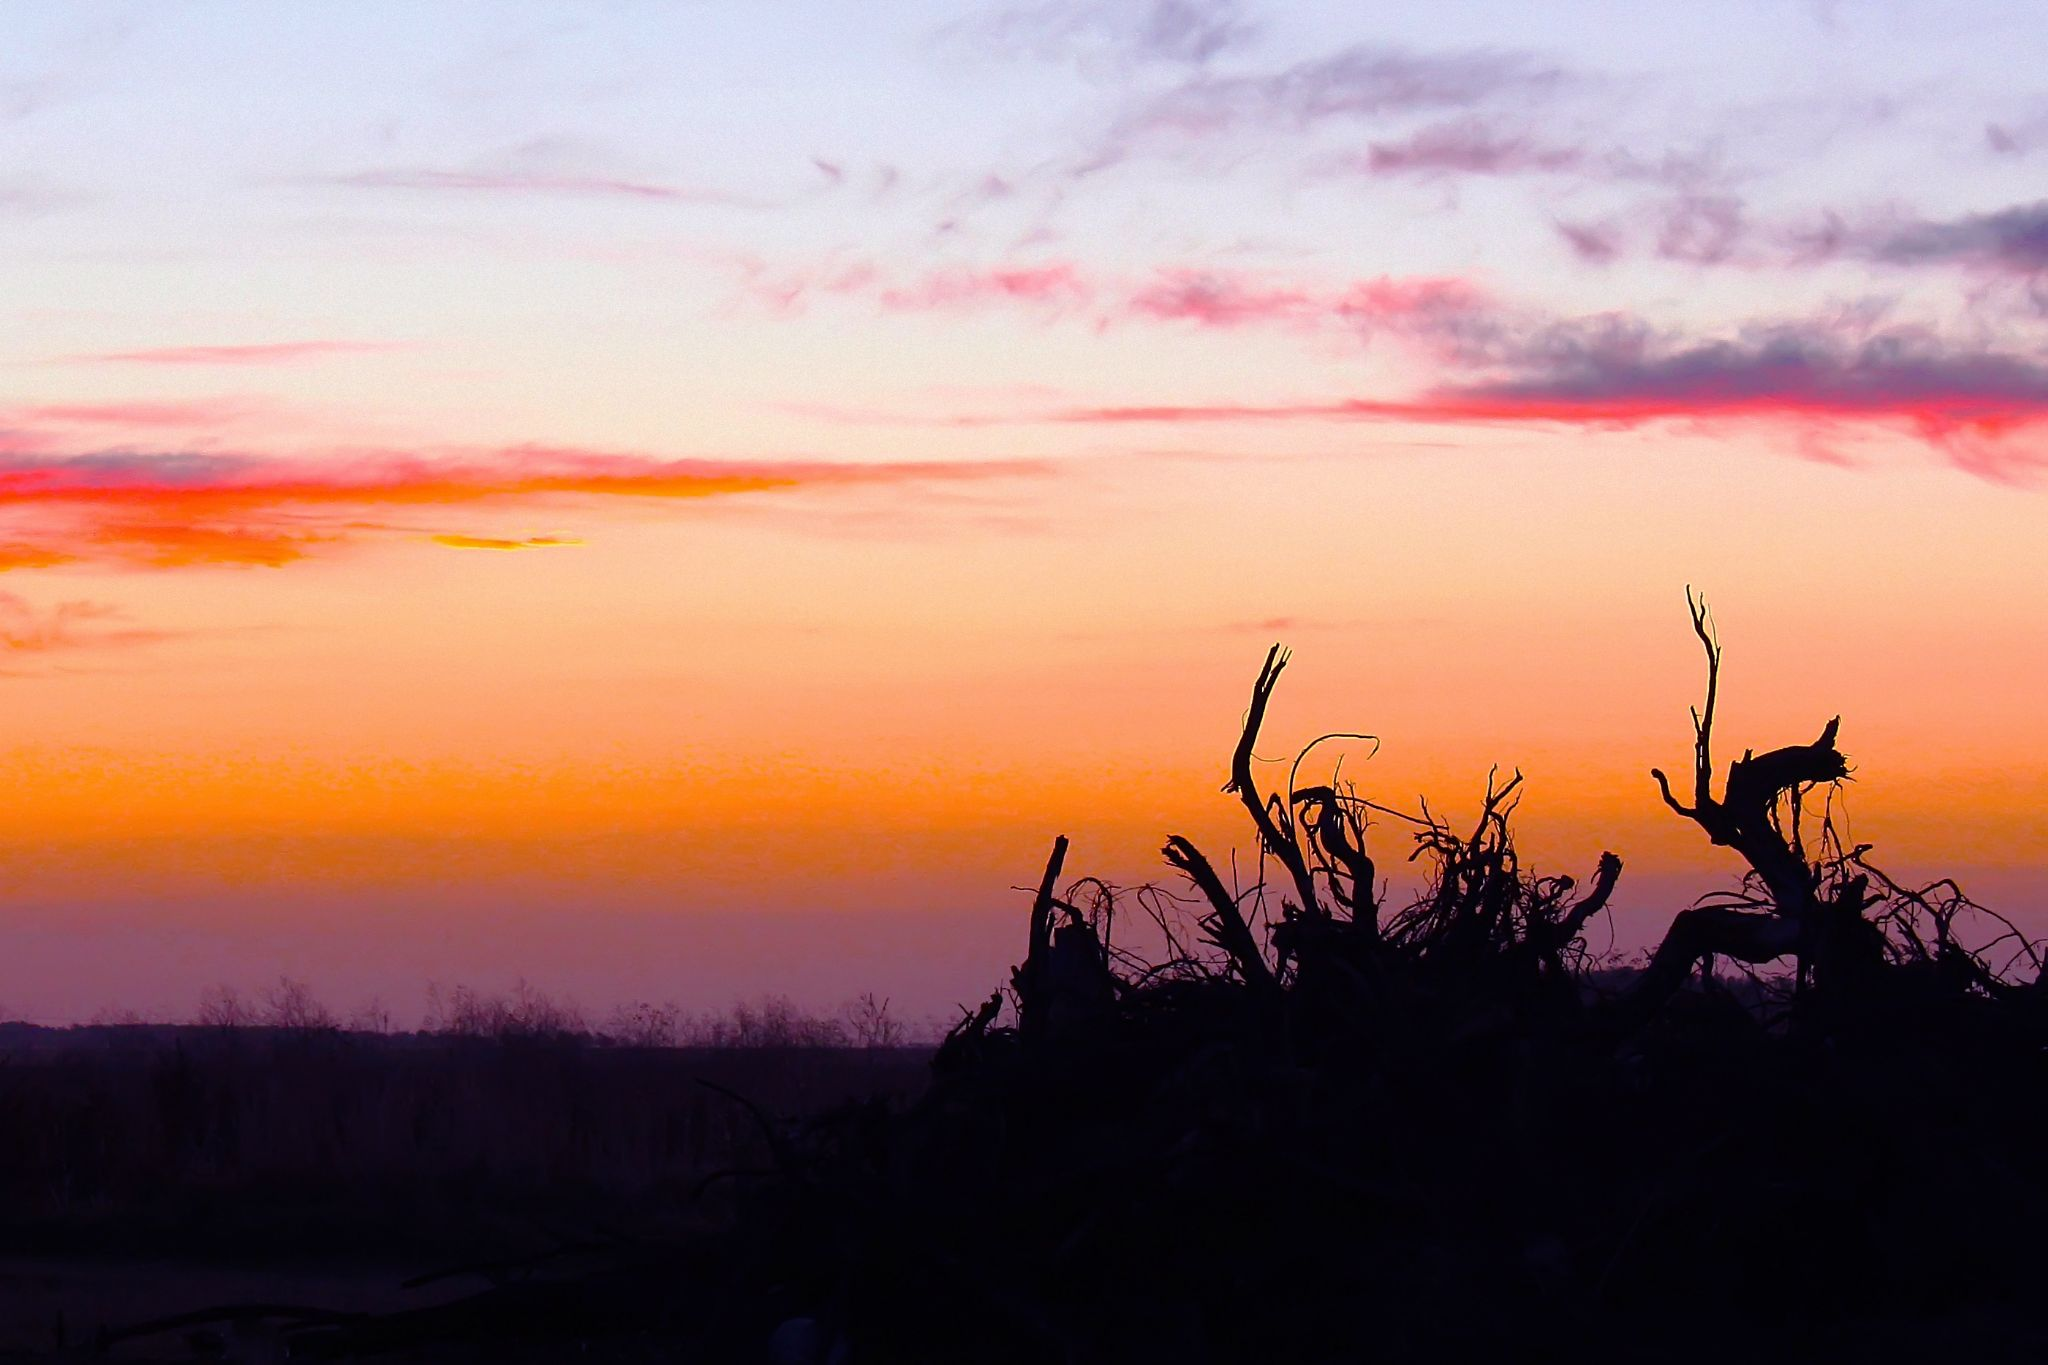 Sunset with no sun by Pablo Passero